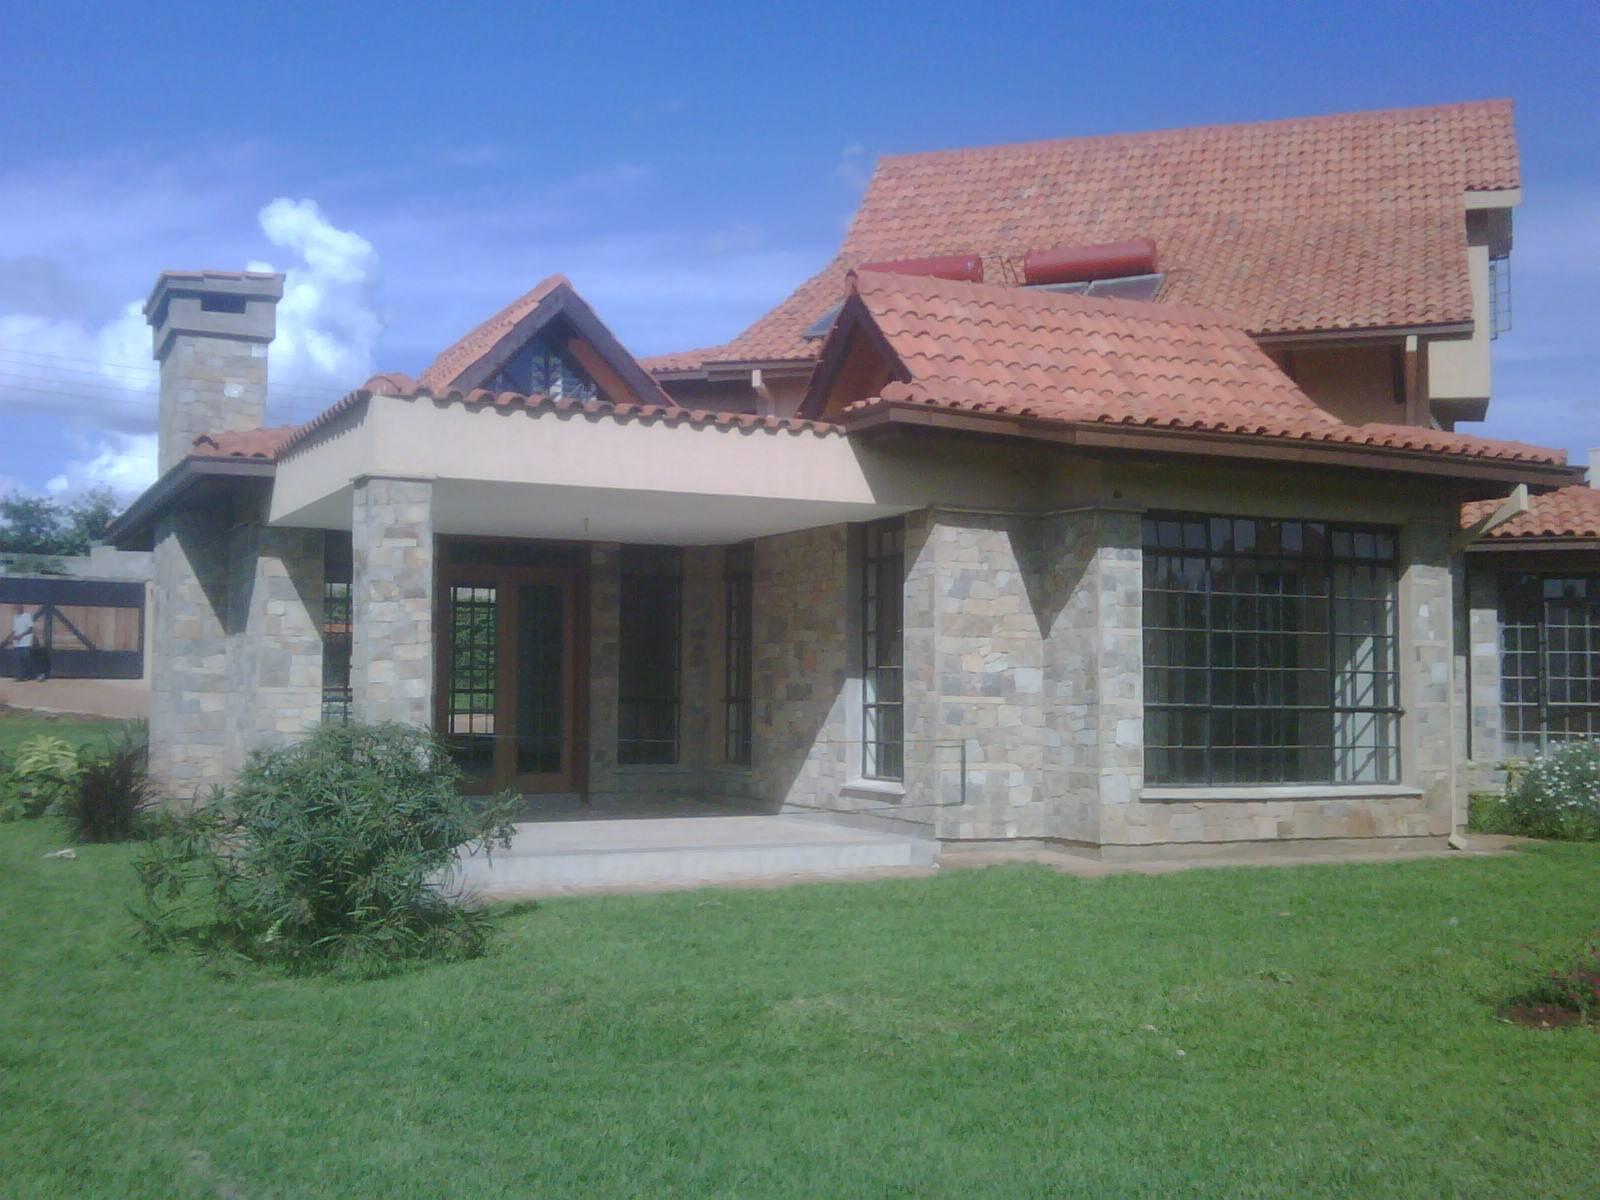 Villa for rent nairobi nairobi area kenya to let runda villa in eagle park md593741 4500 usd 2010 12 08 mondinion com global real estate